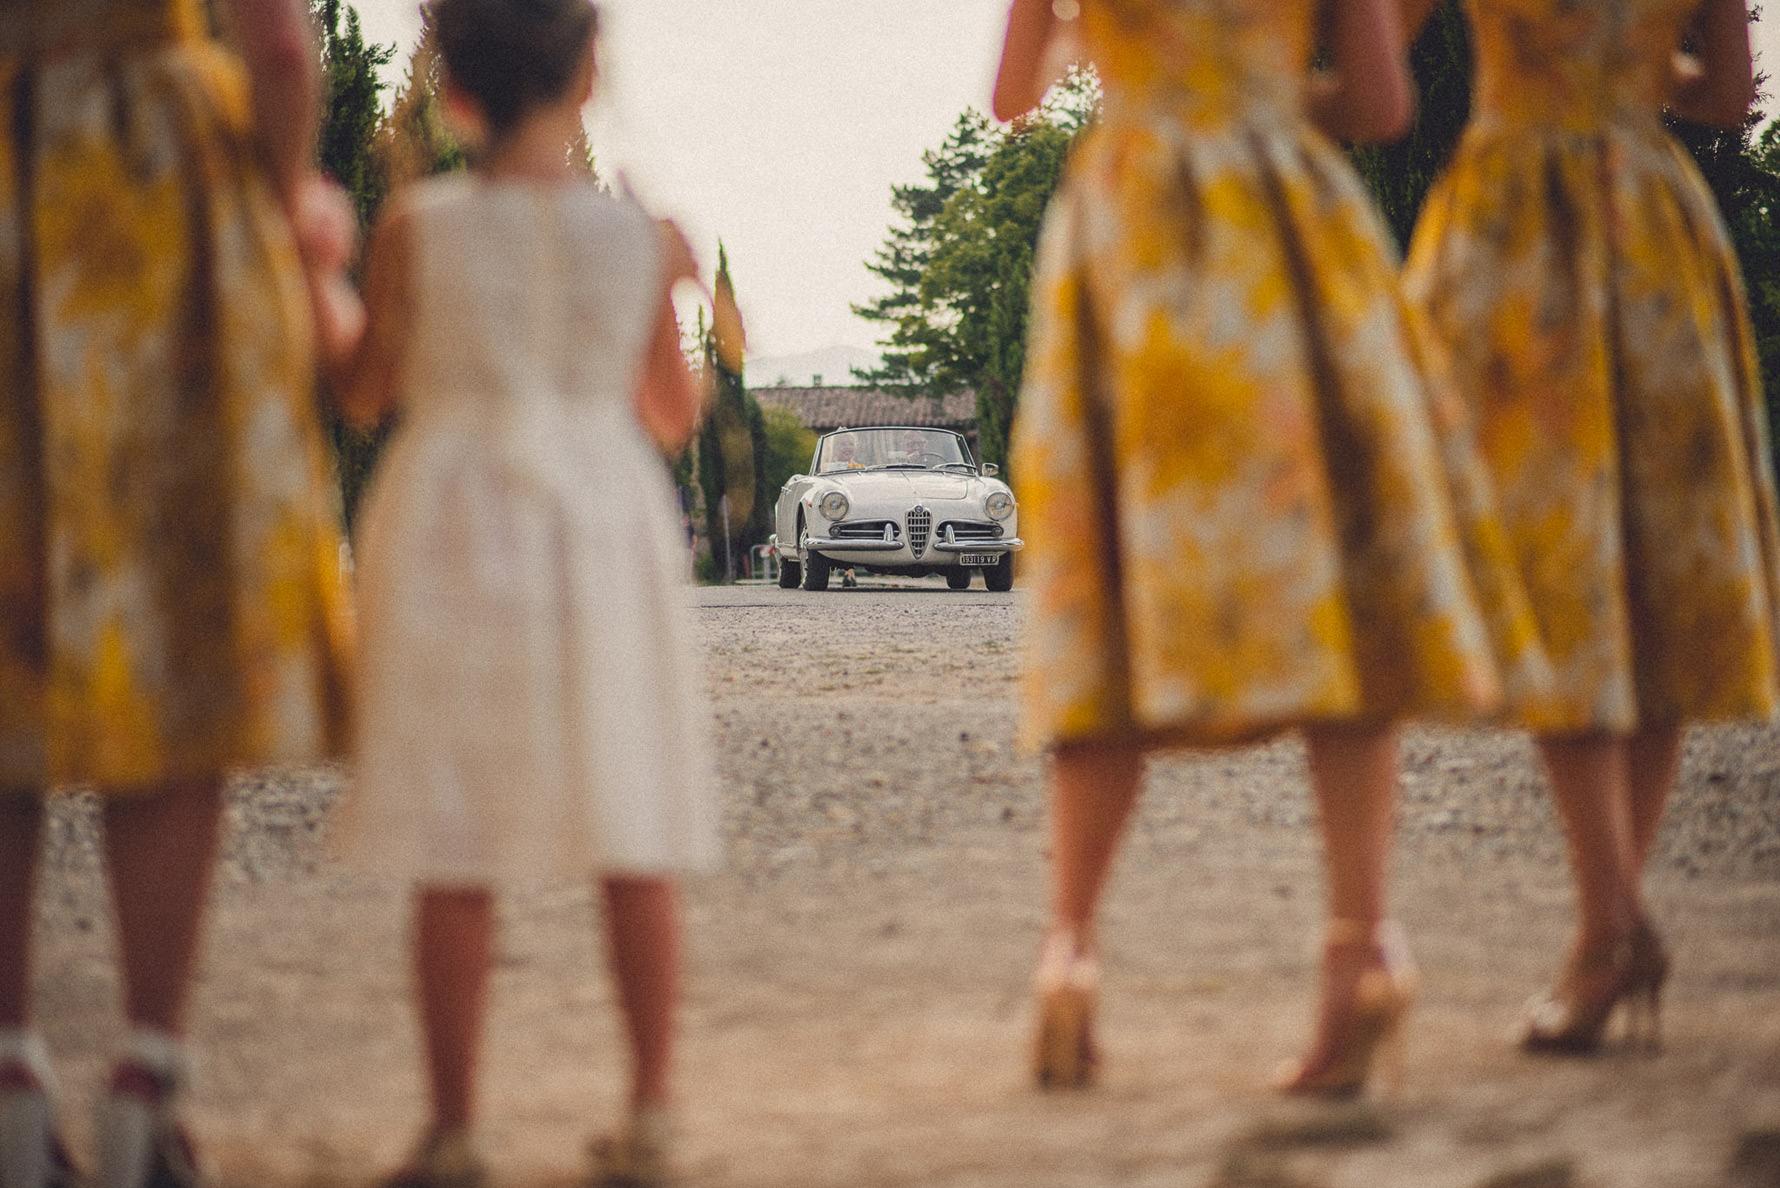 saint-galgano-wedding-photographer-livio-lacurre-photography